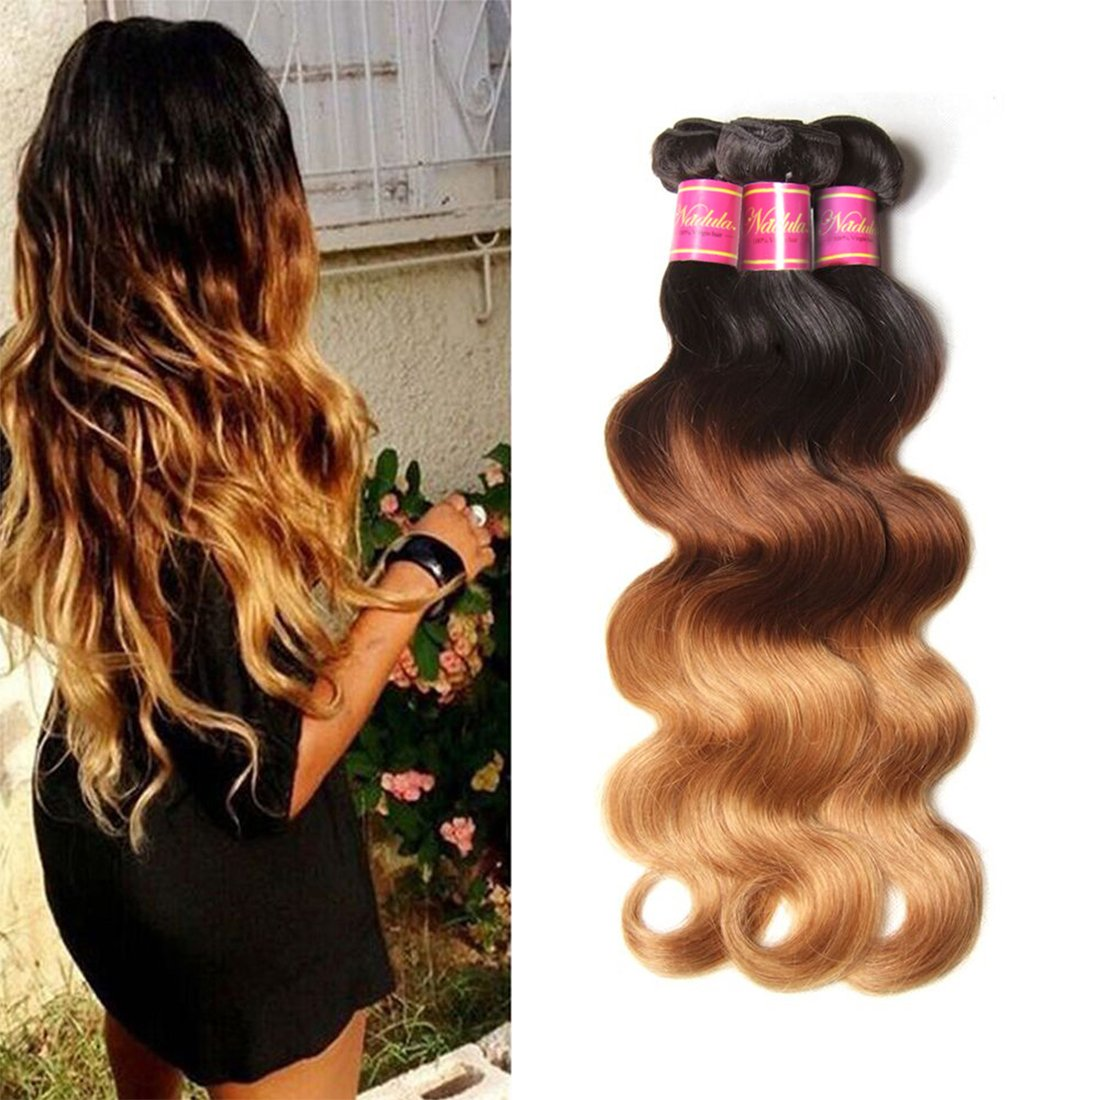 Nadula 7A Grade Brazilian 3 Tone Ombre Color 1B/4/27# Body Wave Hair 3 Bundles Cheap Brazilian Virgin Human Hair Products 100+/-5g/pcs Weave Extensions Natural Color (16 18 20)